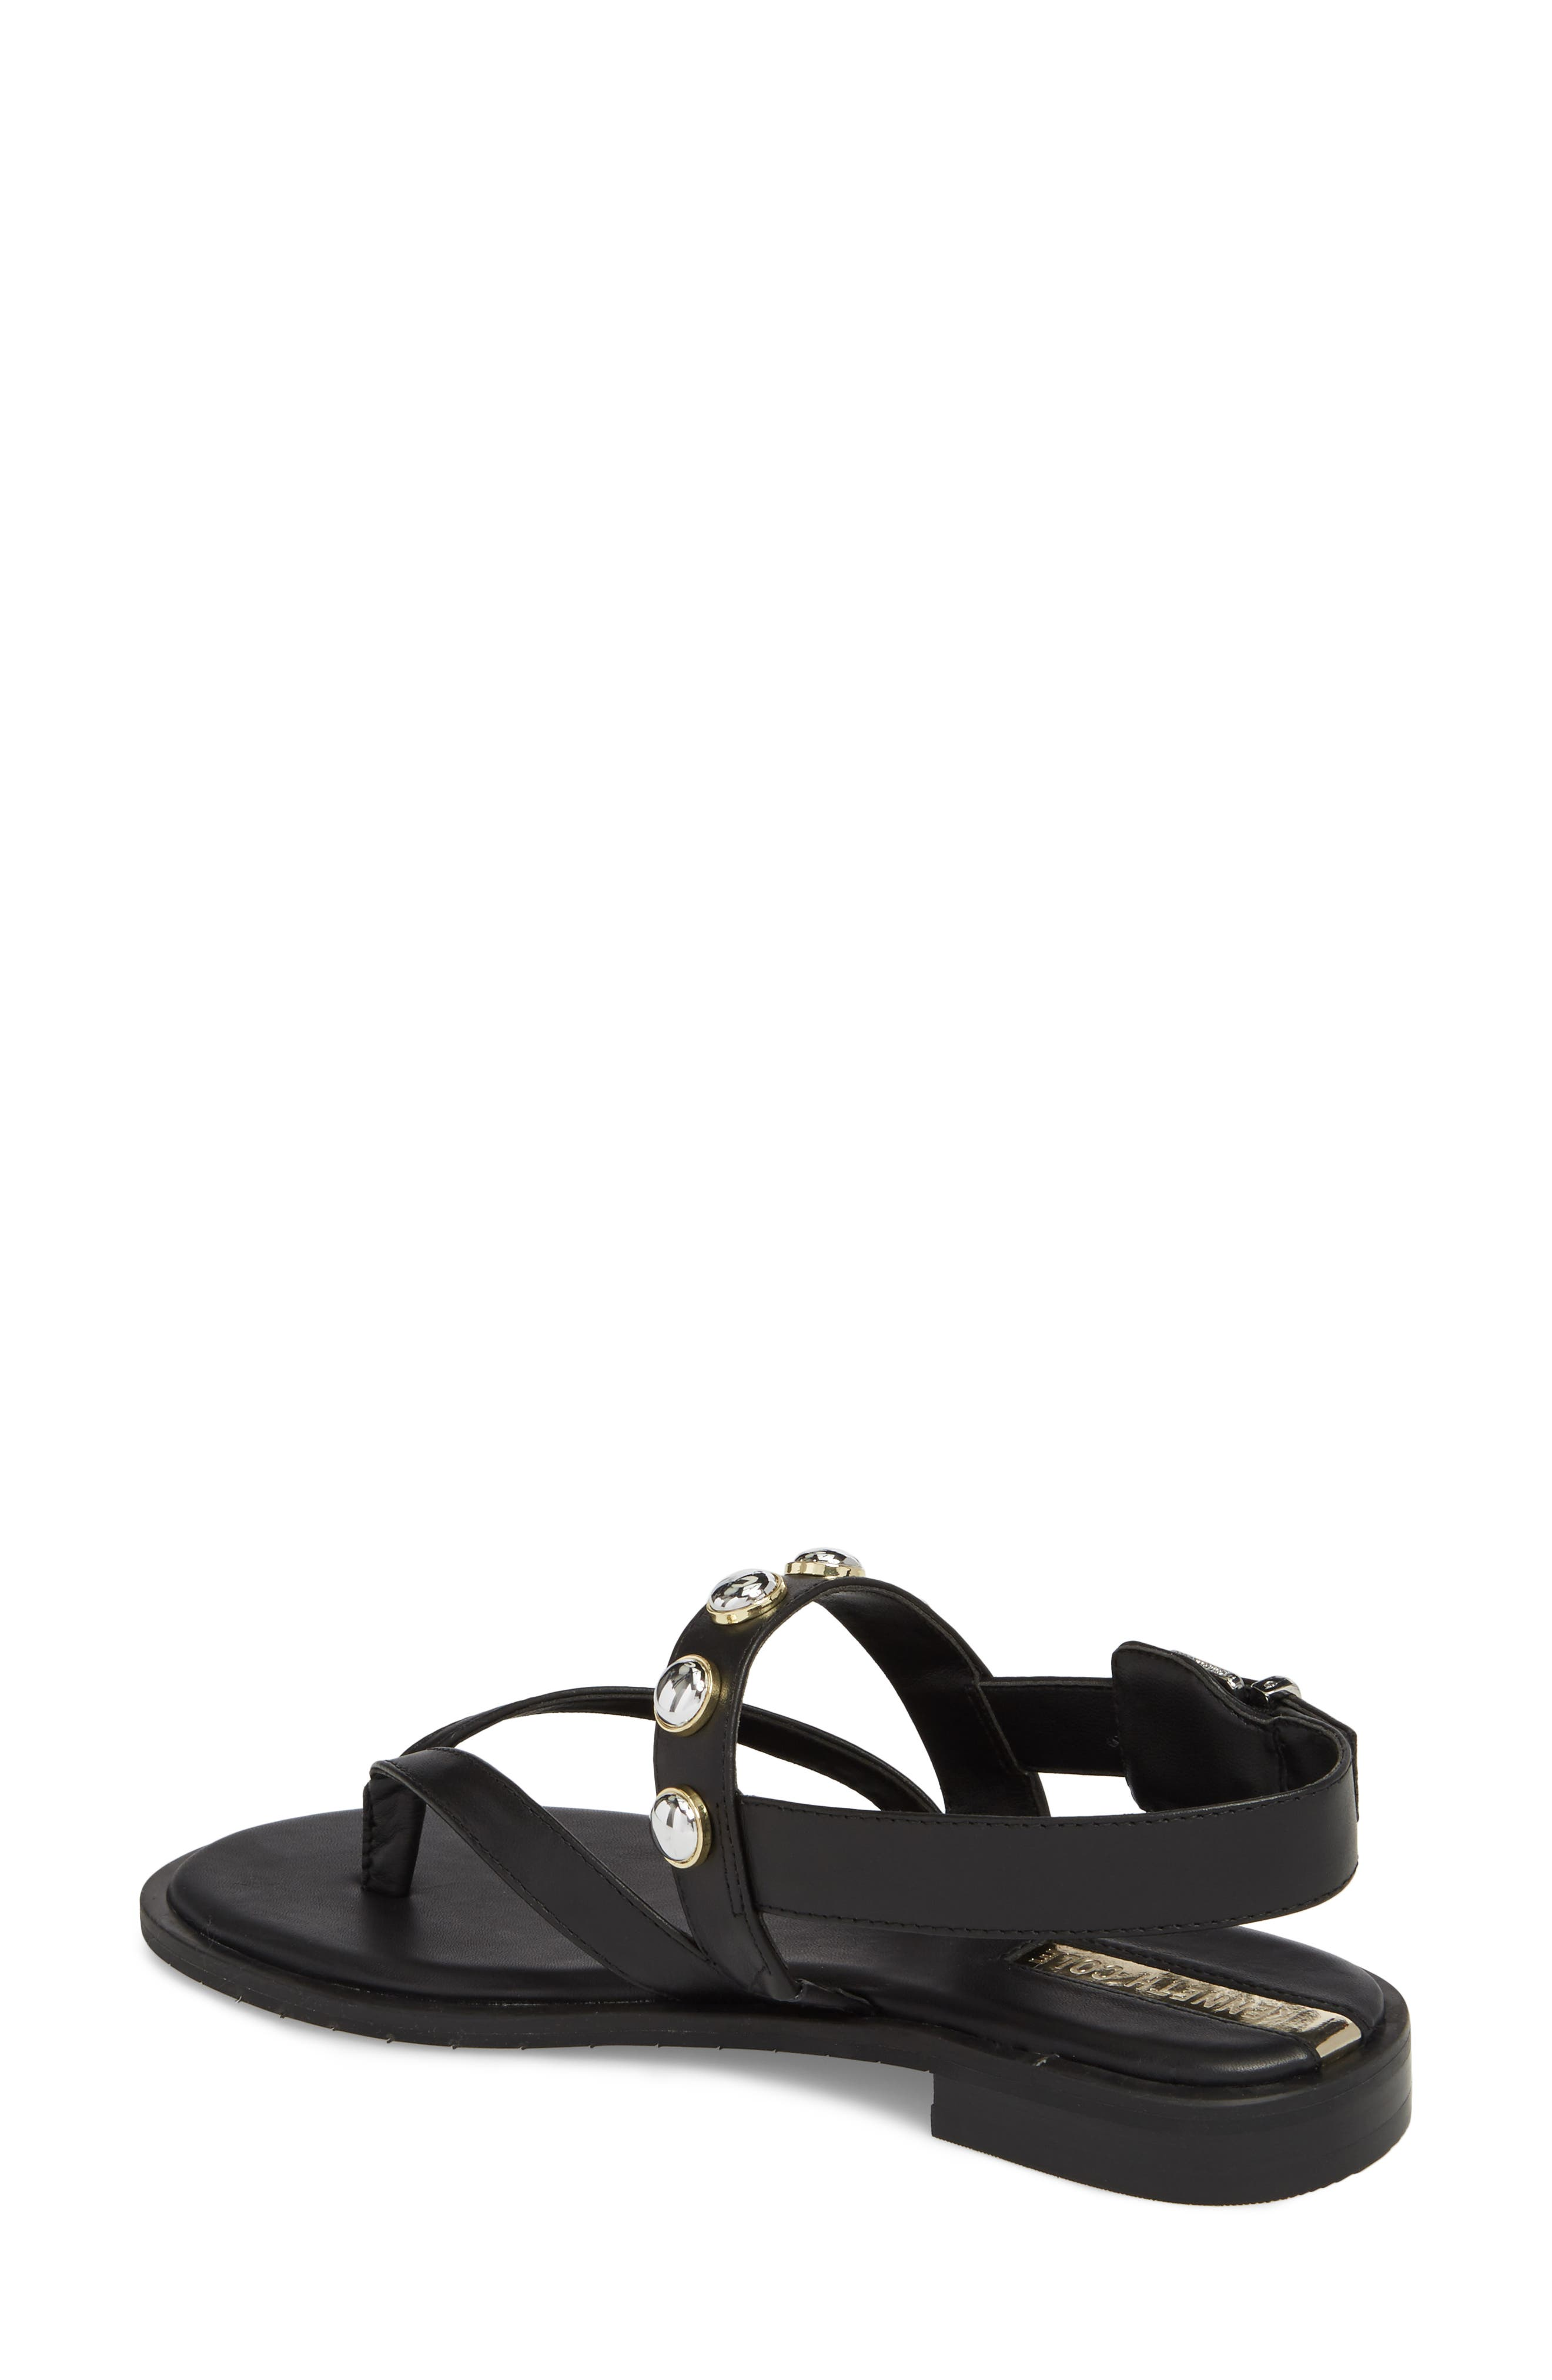 Tama Studded Sandal,                             Alternate thumbnail 2, color,                             001